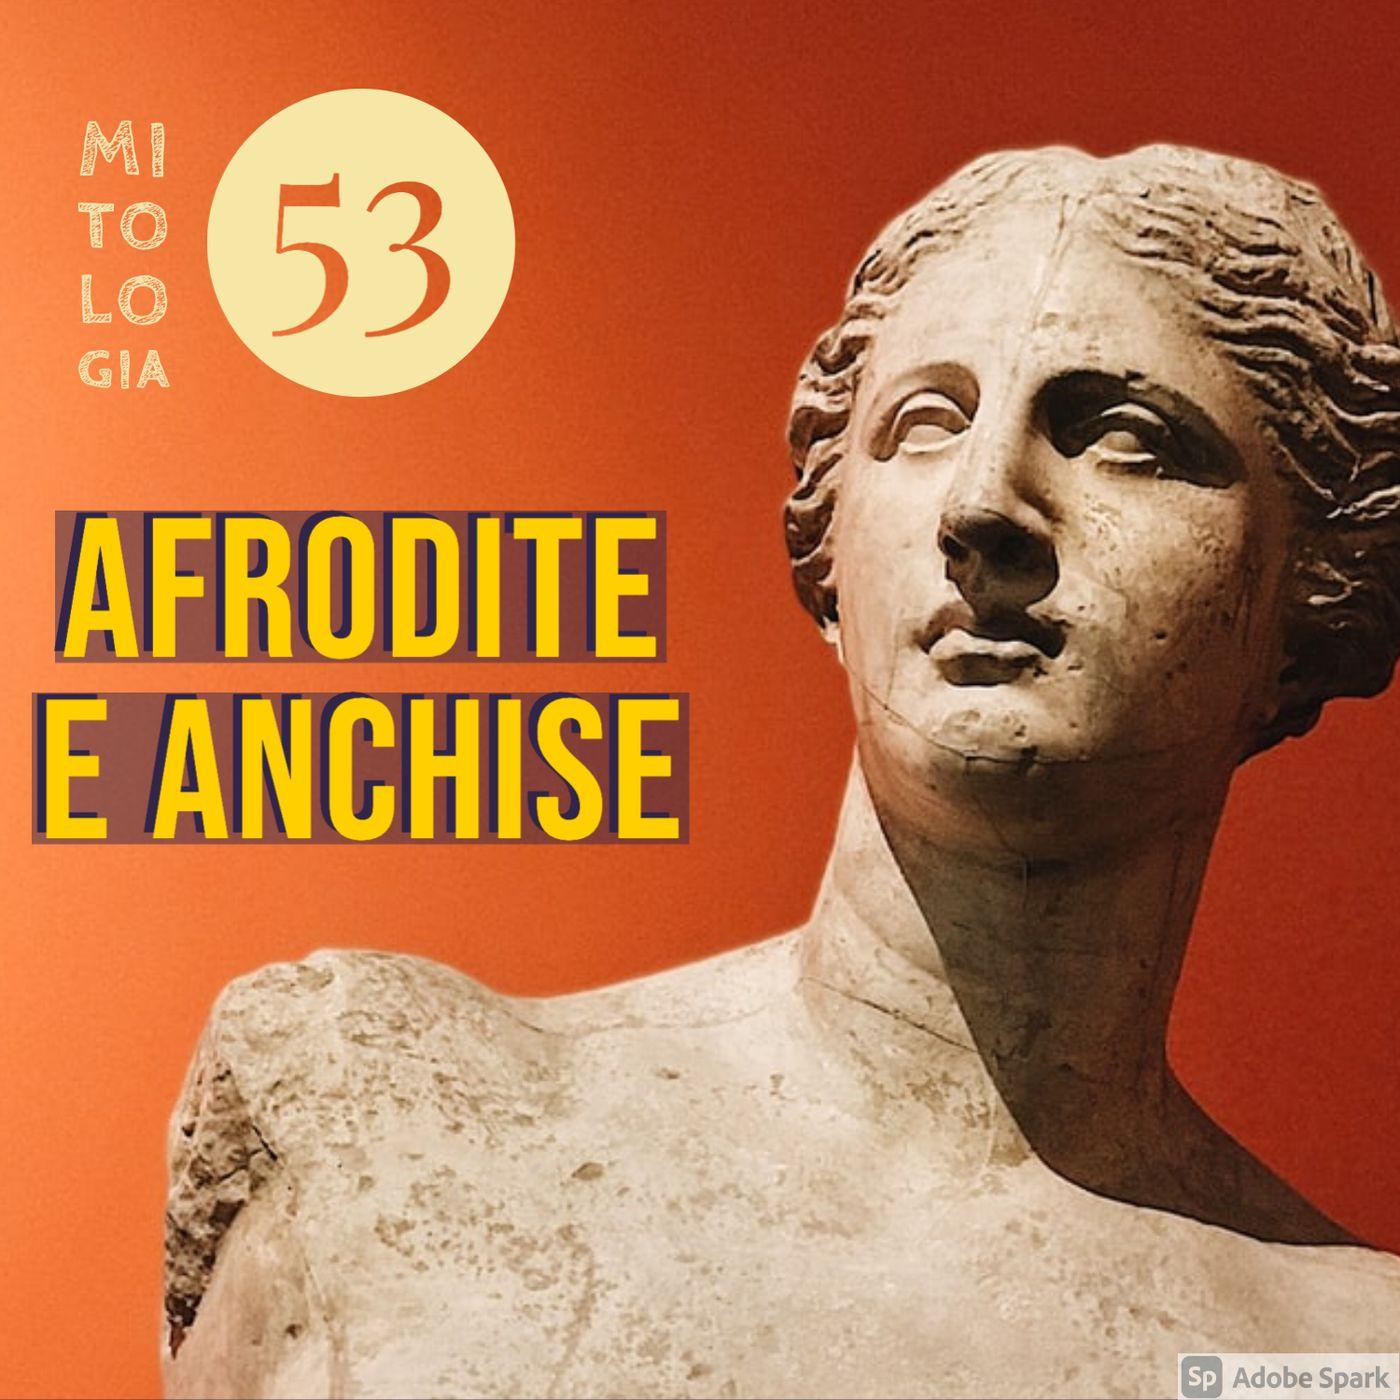 Afrodite ed Anchise